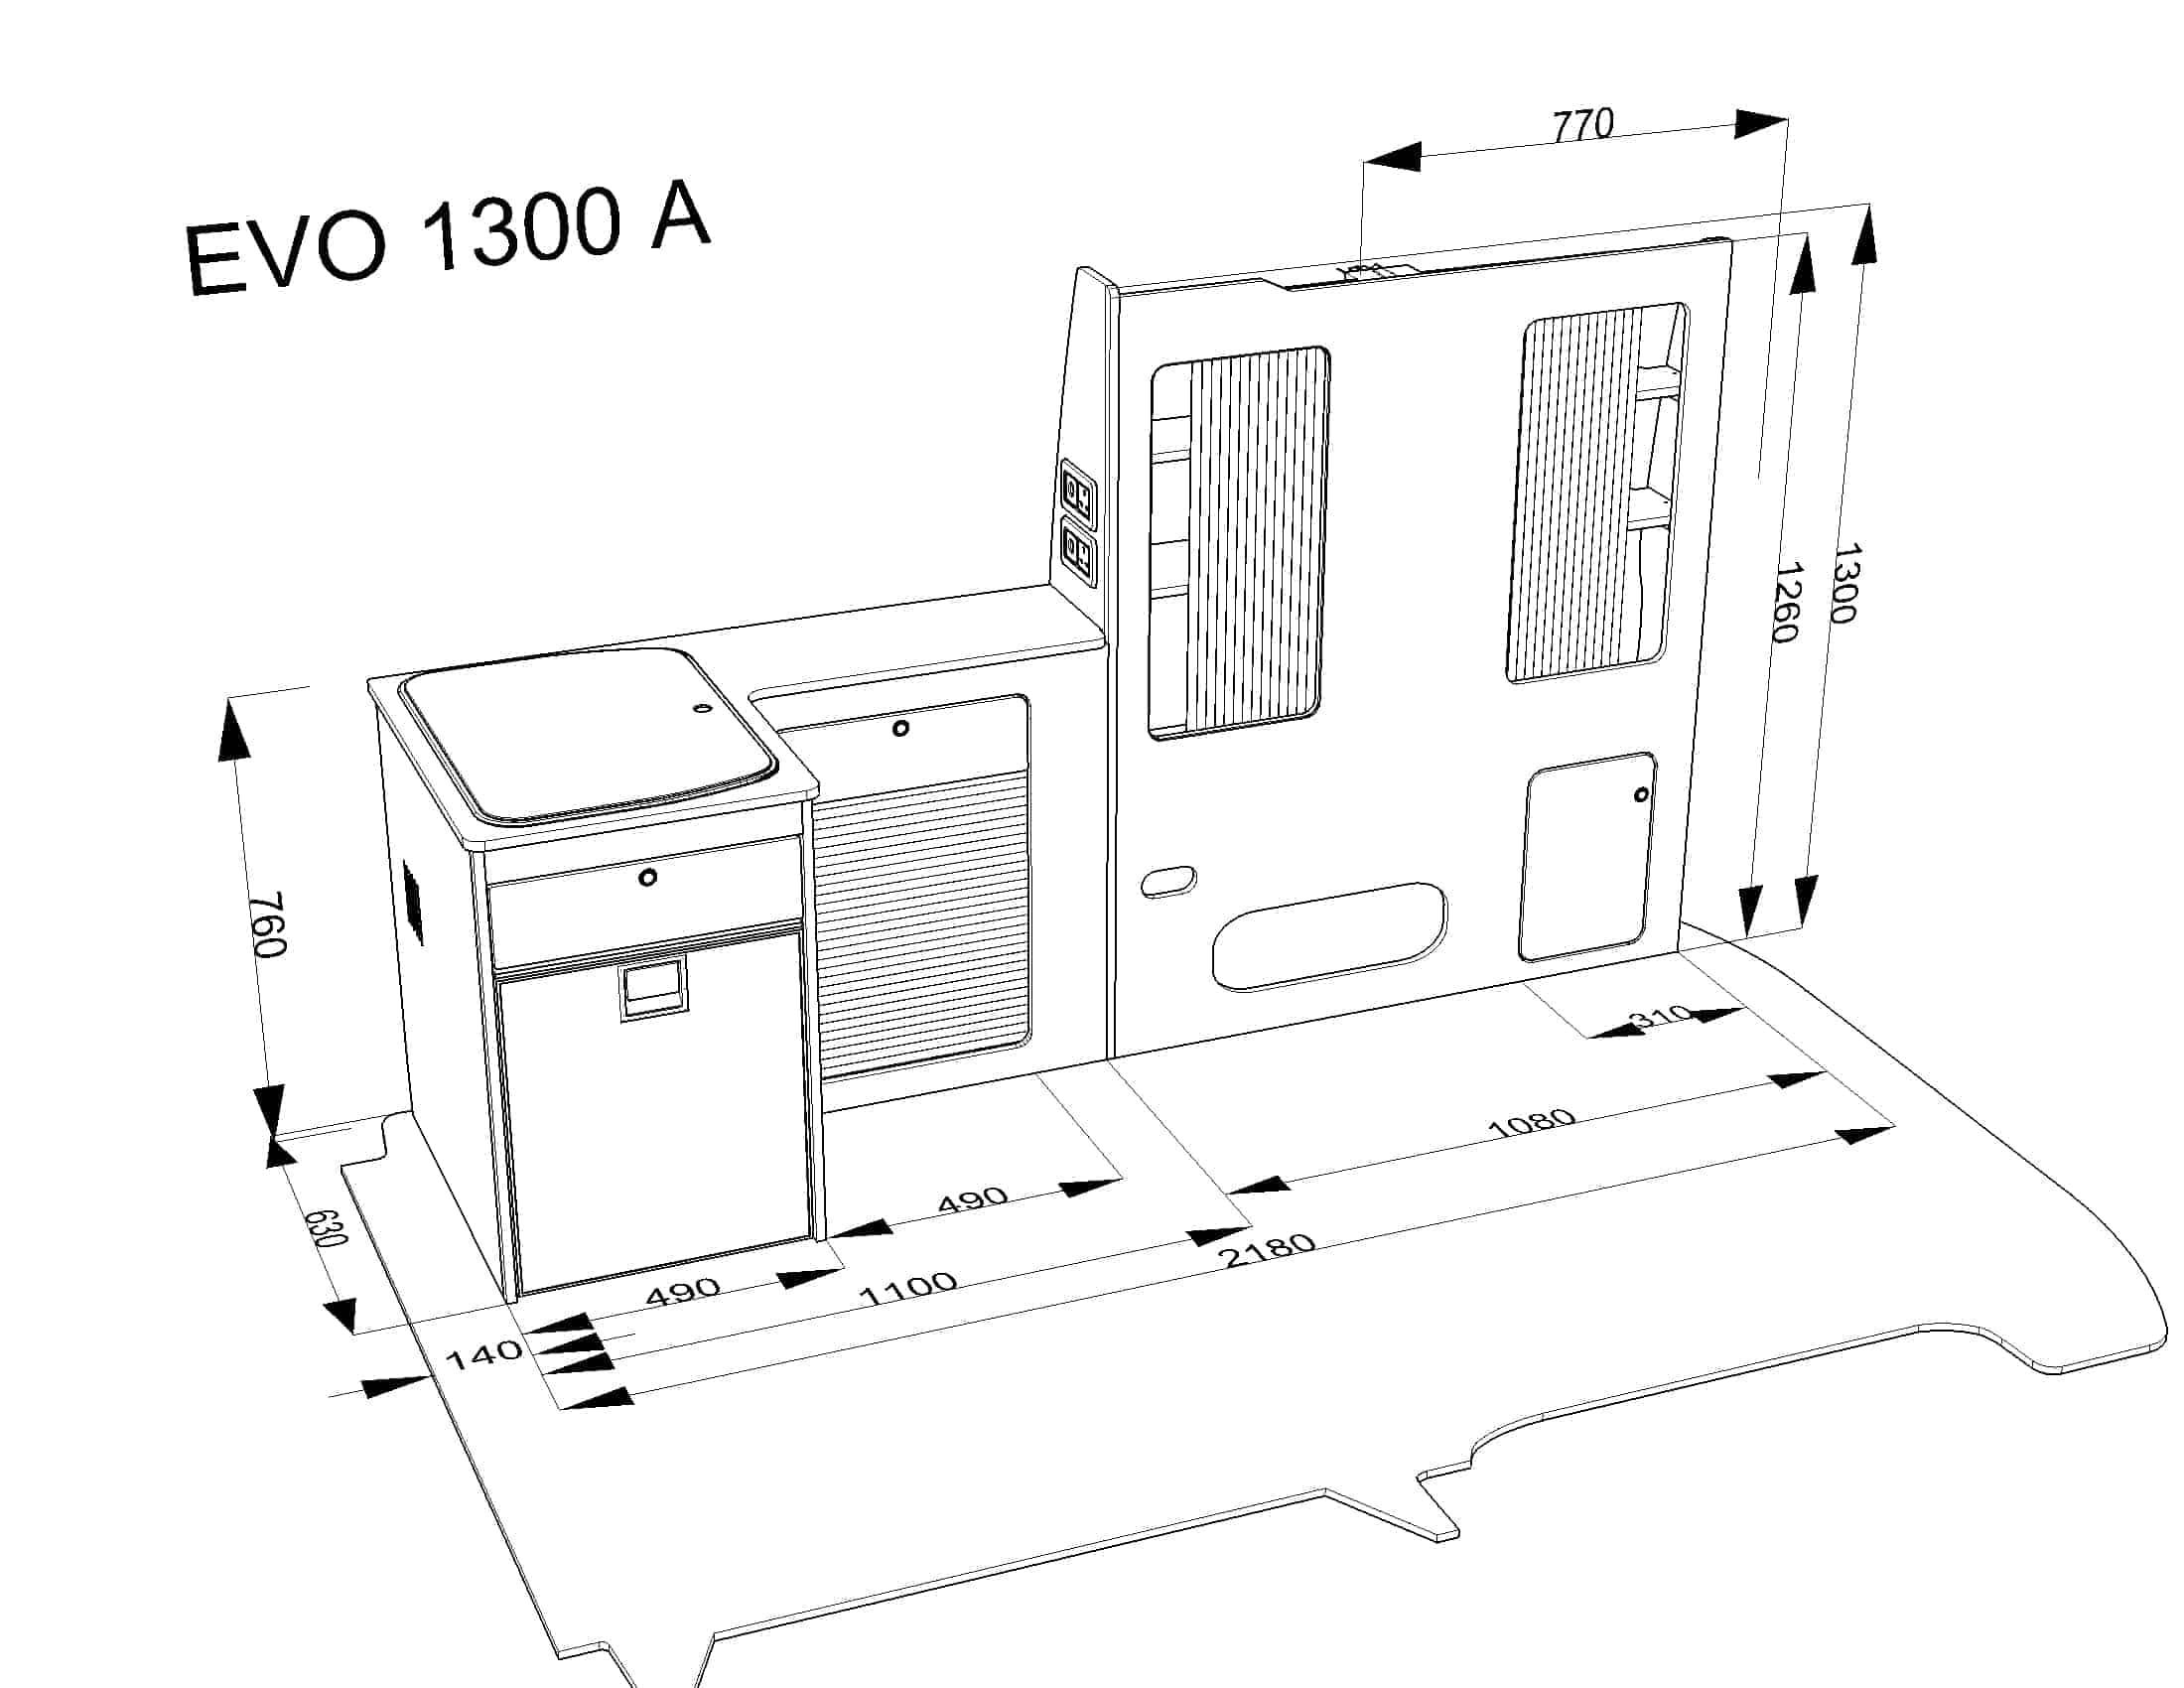 Furniture kit 1300 a rib seat vw t5 short wheel base for Campervan furniture plans